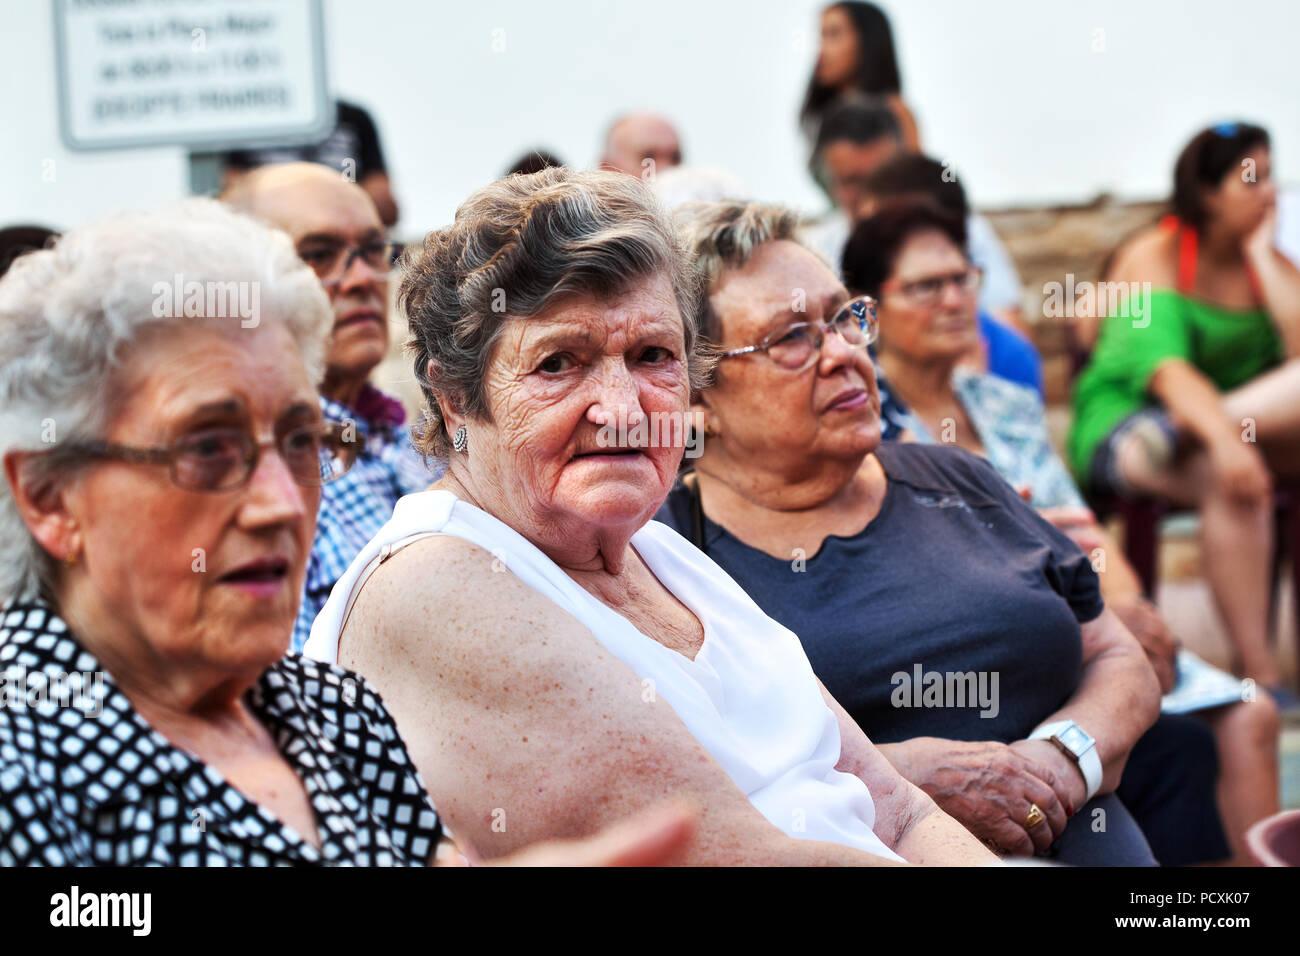 Locals sat in the main square, Cherta, Tarragona, Spain. - Stock Image